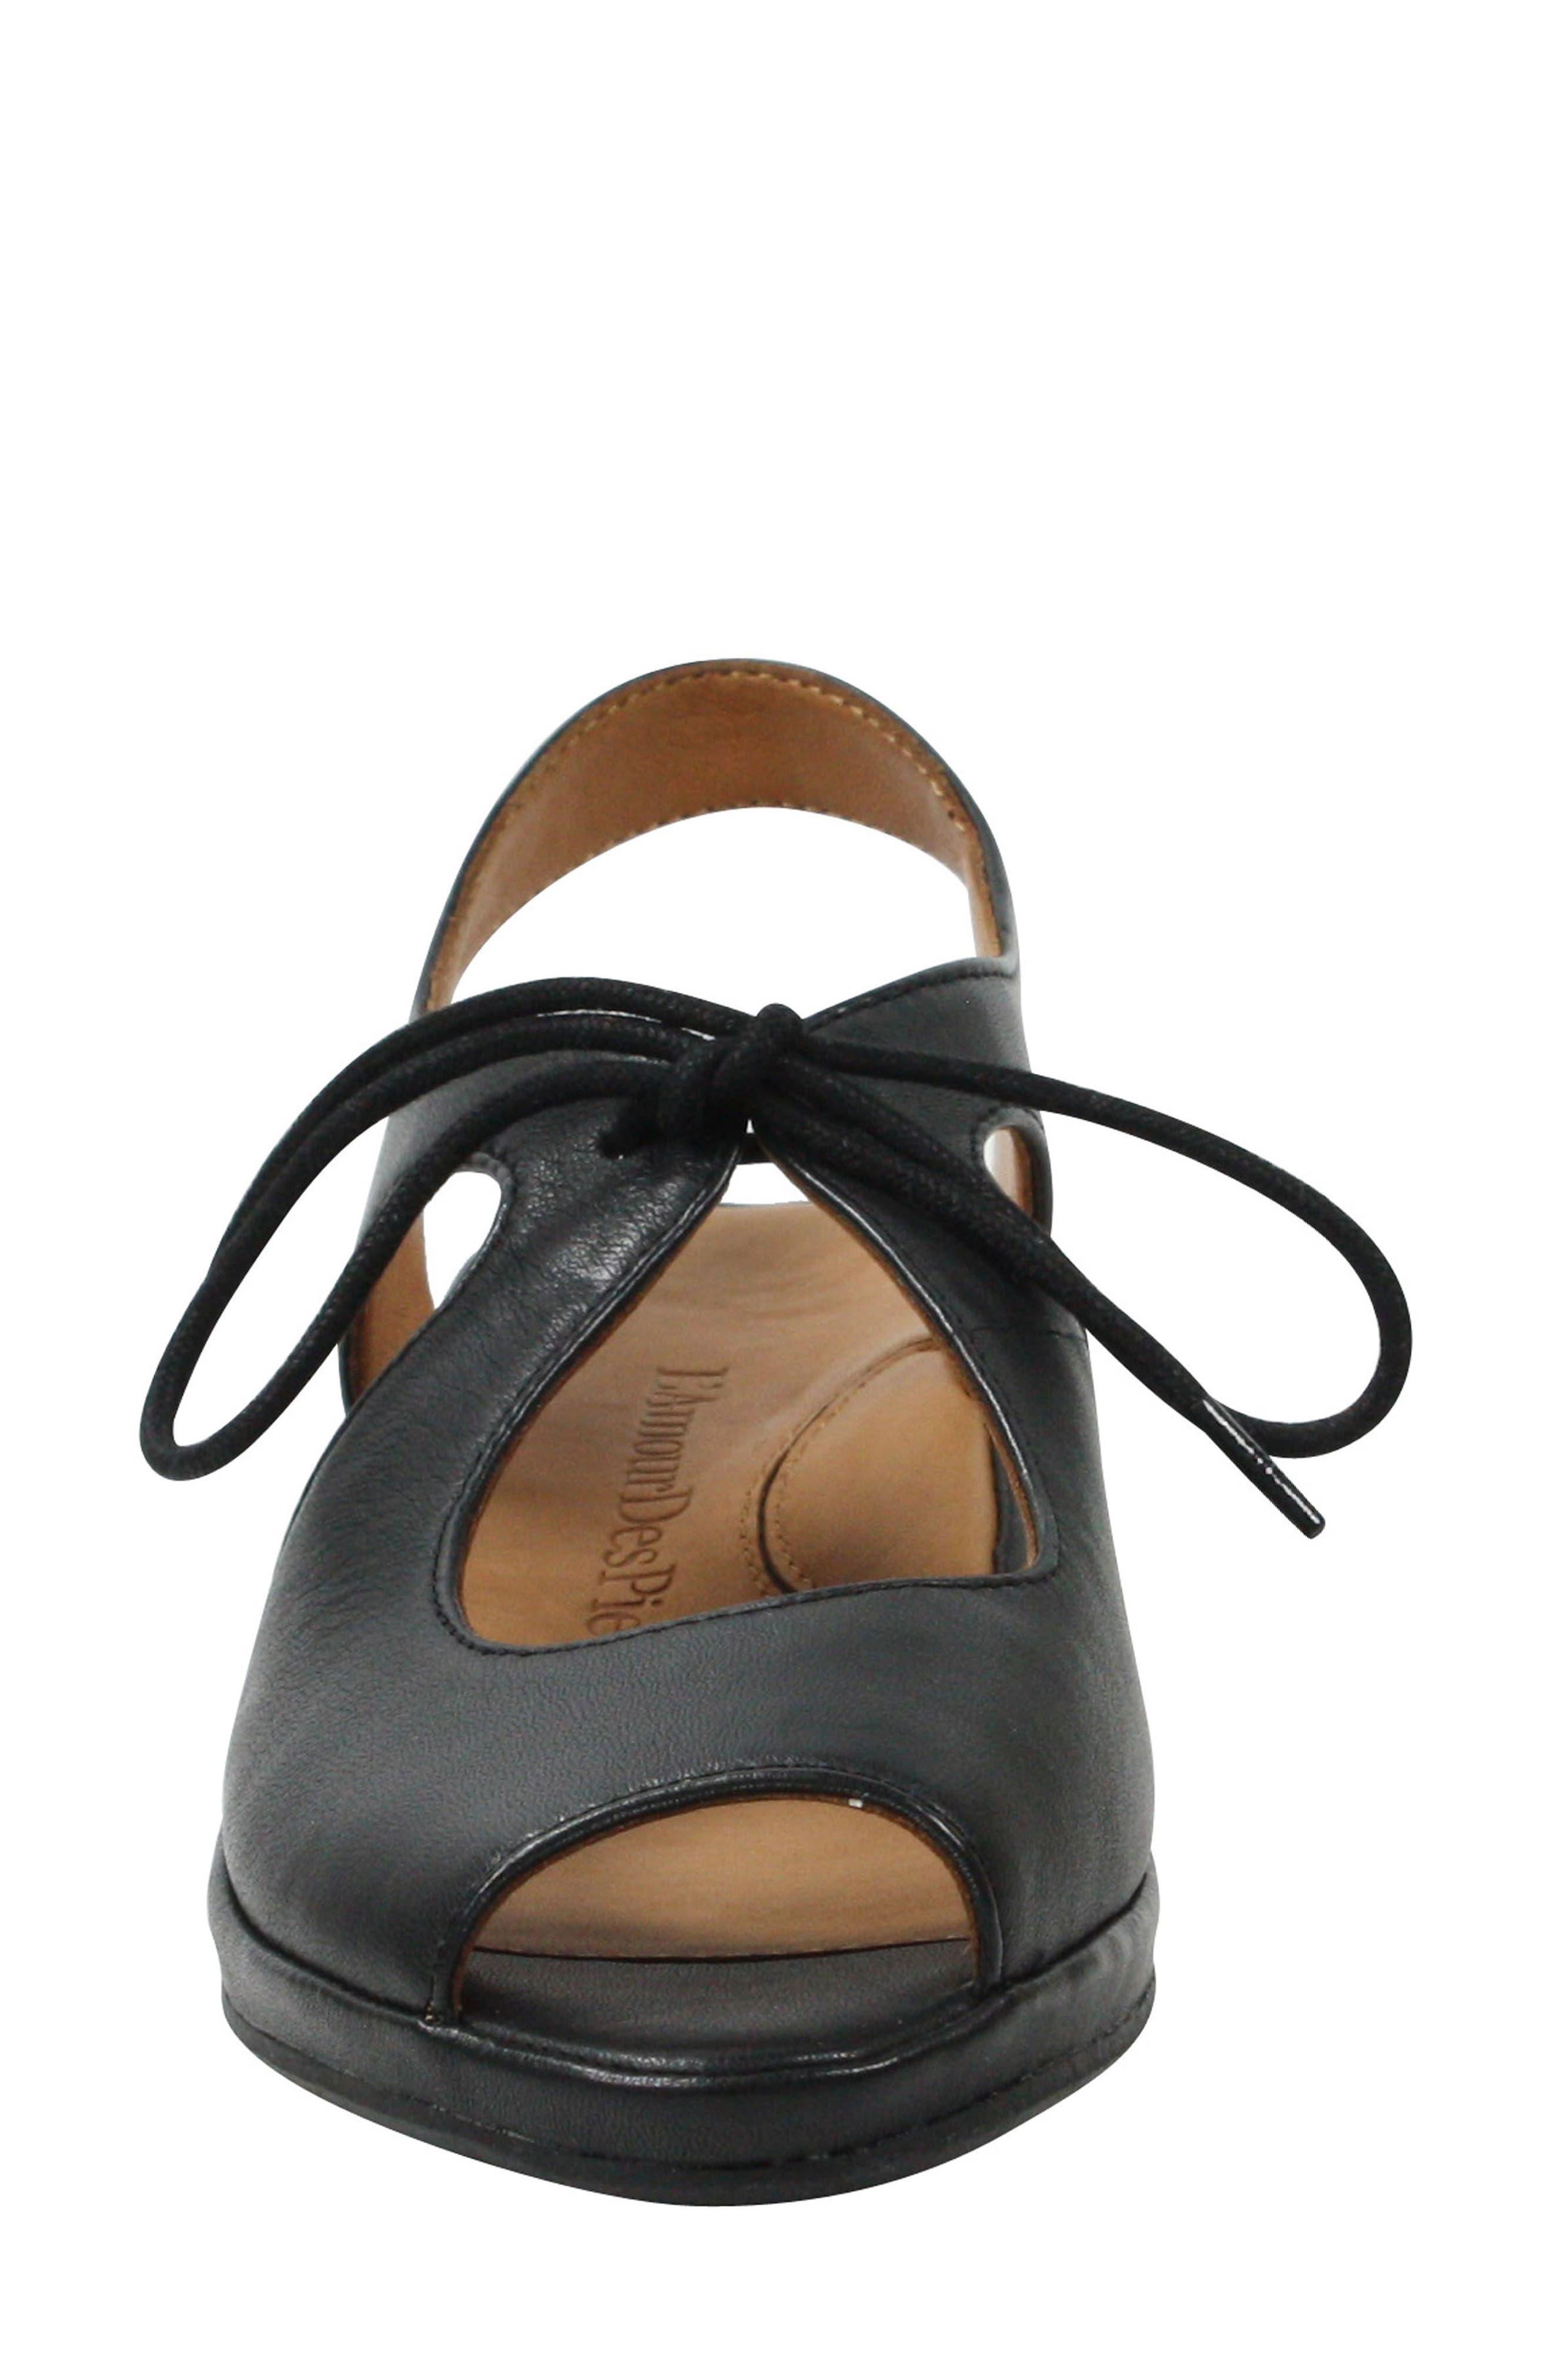 Brettany Sandal,                             Alternate thumbnail 3, color,                             Black Leather